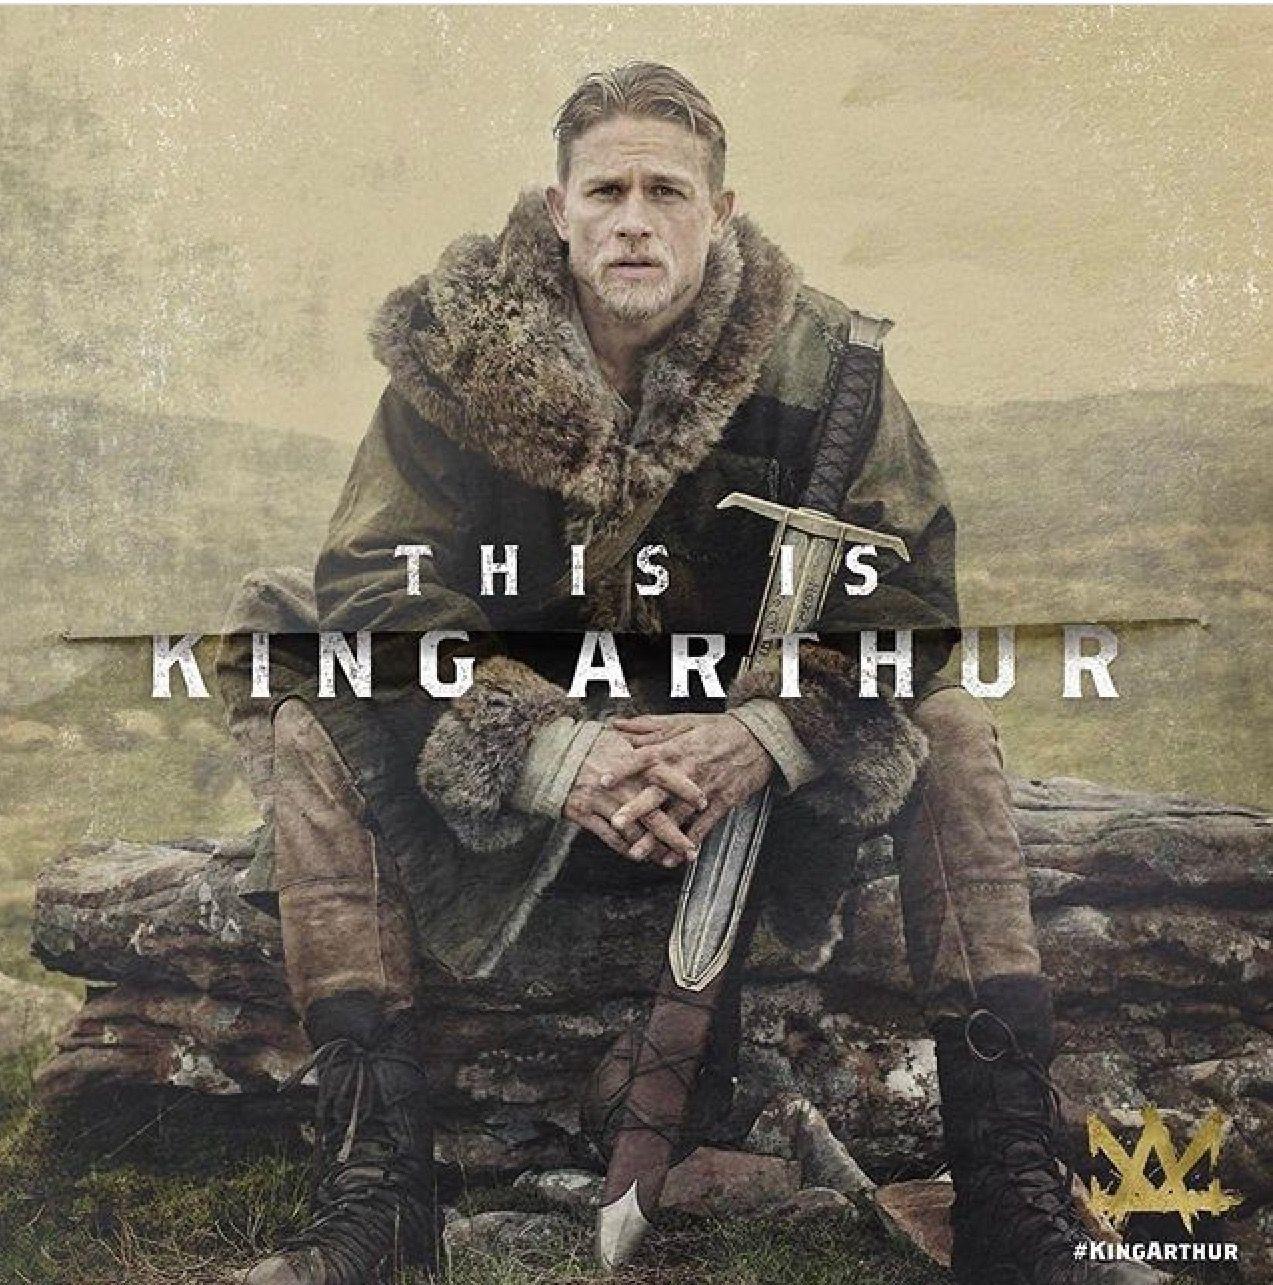 charlie hunnam king arthur random pinterest charlie hunnam